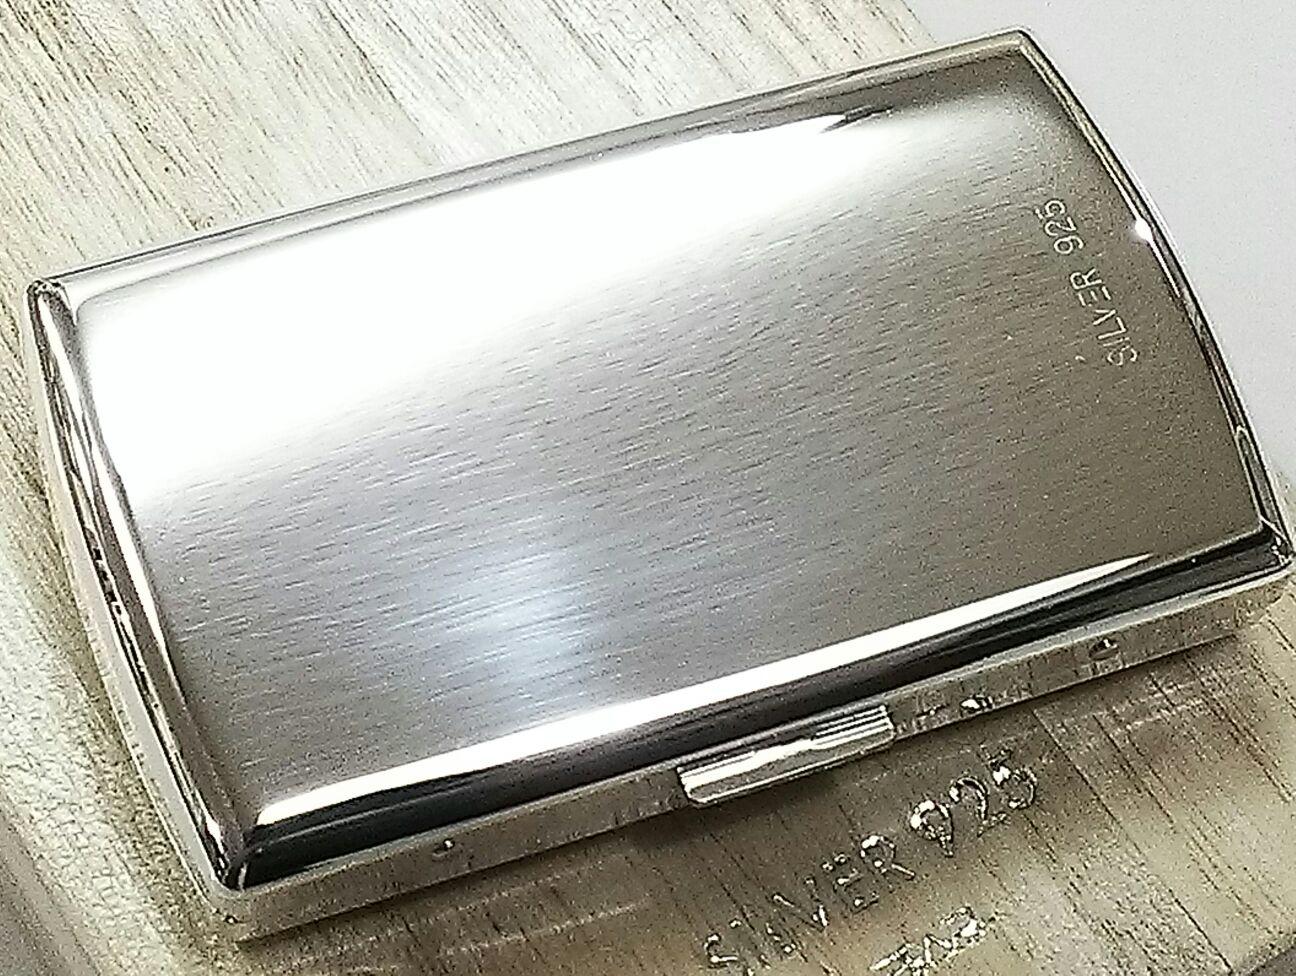 【PEARL】高級 純銀 シガレットケース 12本 国産ブランド 高級 タバコケース 銀 シルバー925 シンプルで人気 送料無料 85mm